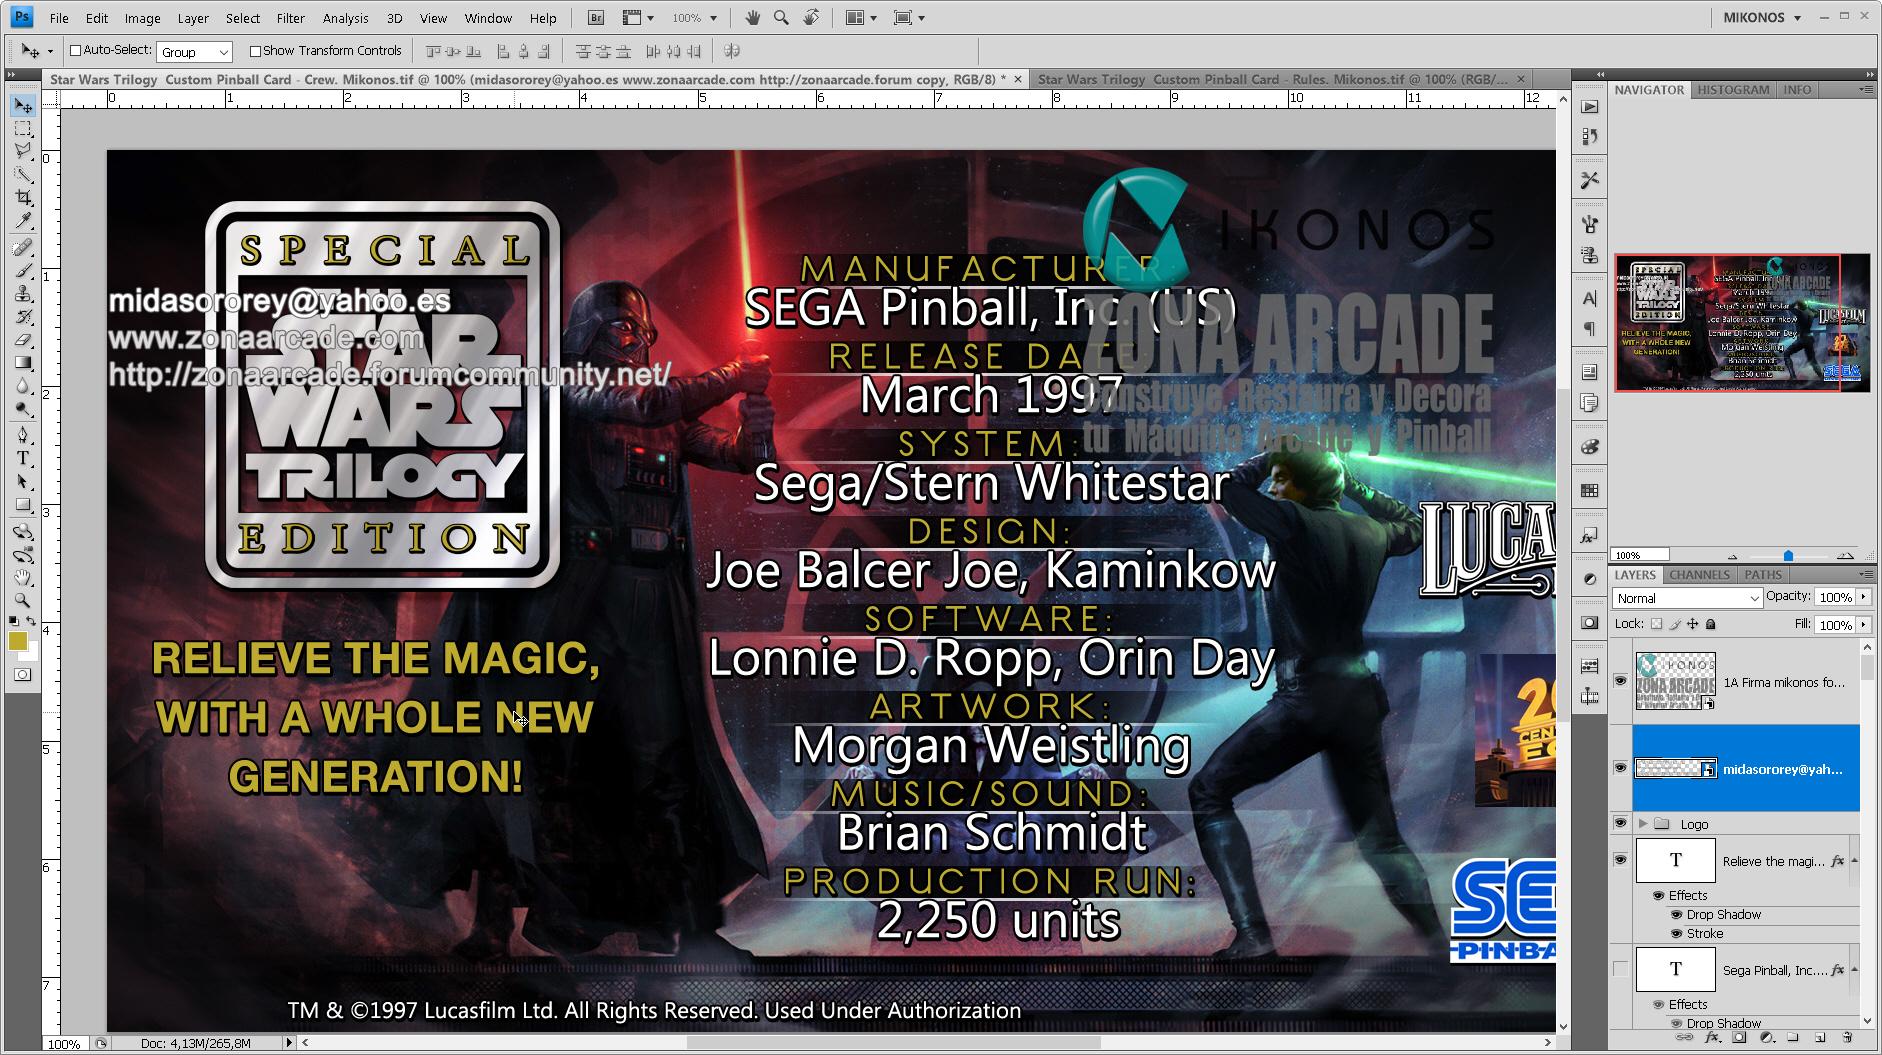 Star Wars Trilogy Pinball Card Customized - Crew. Mikonos2